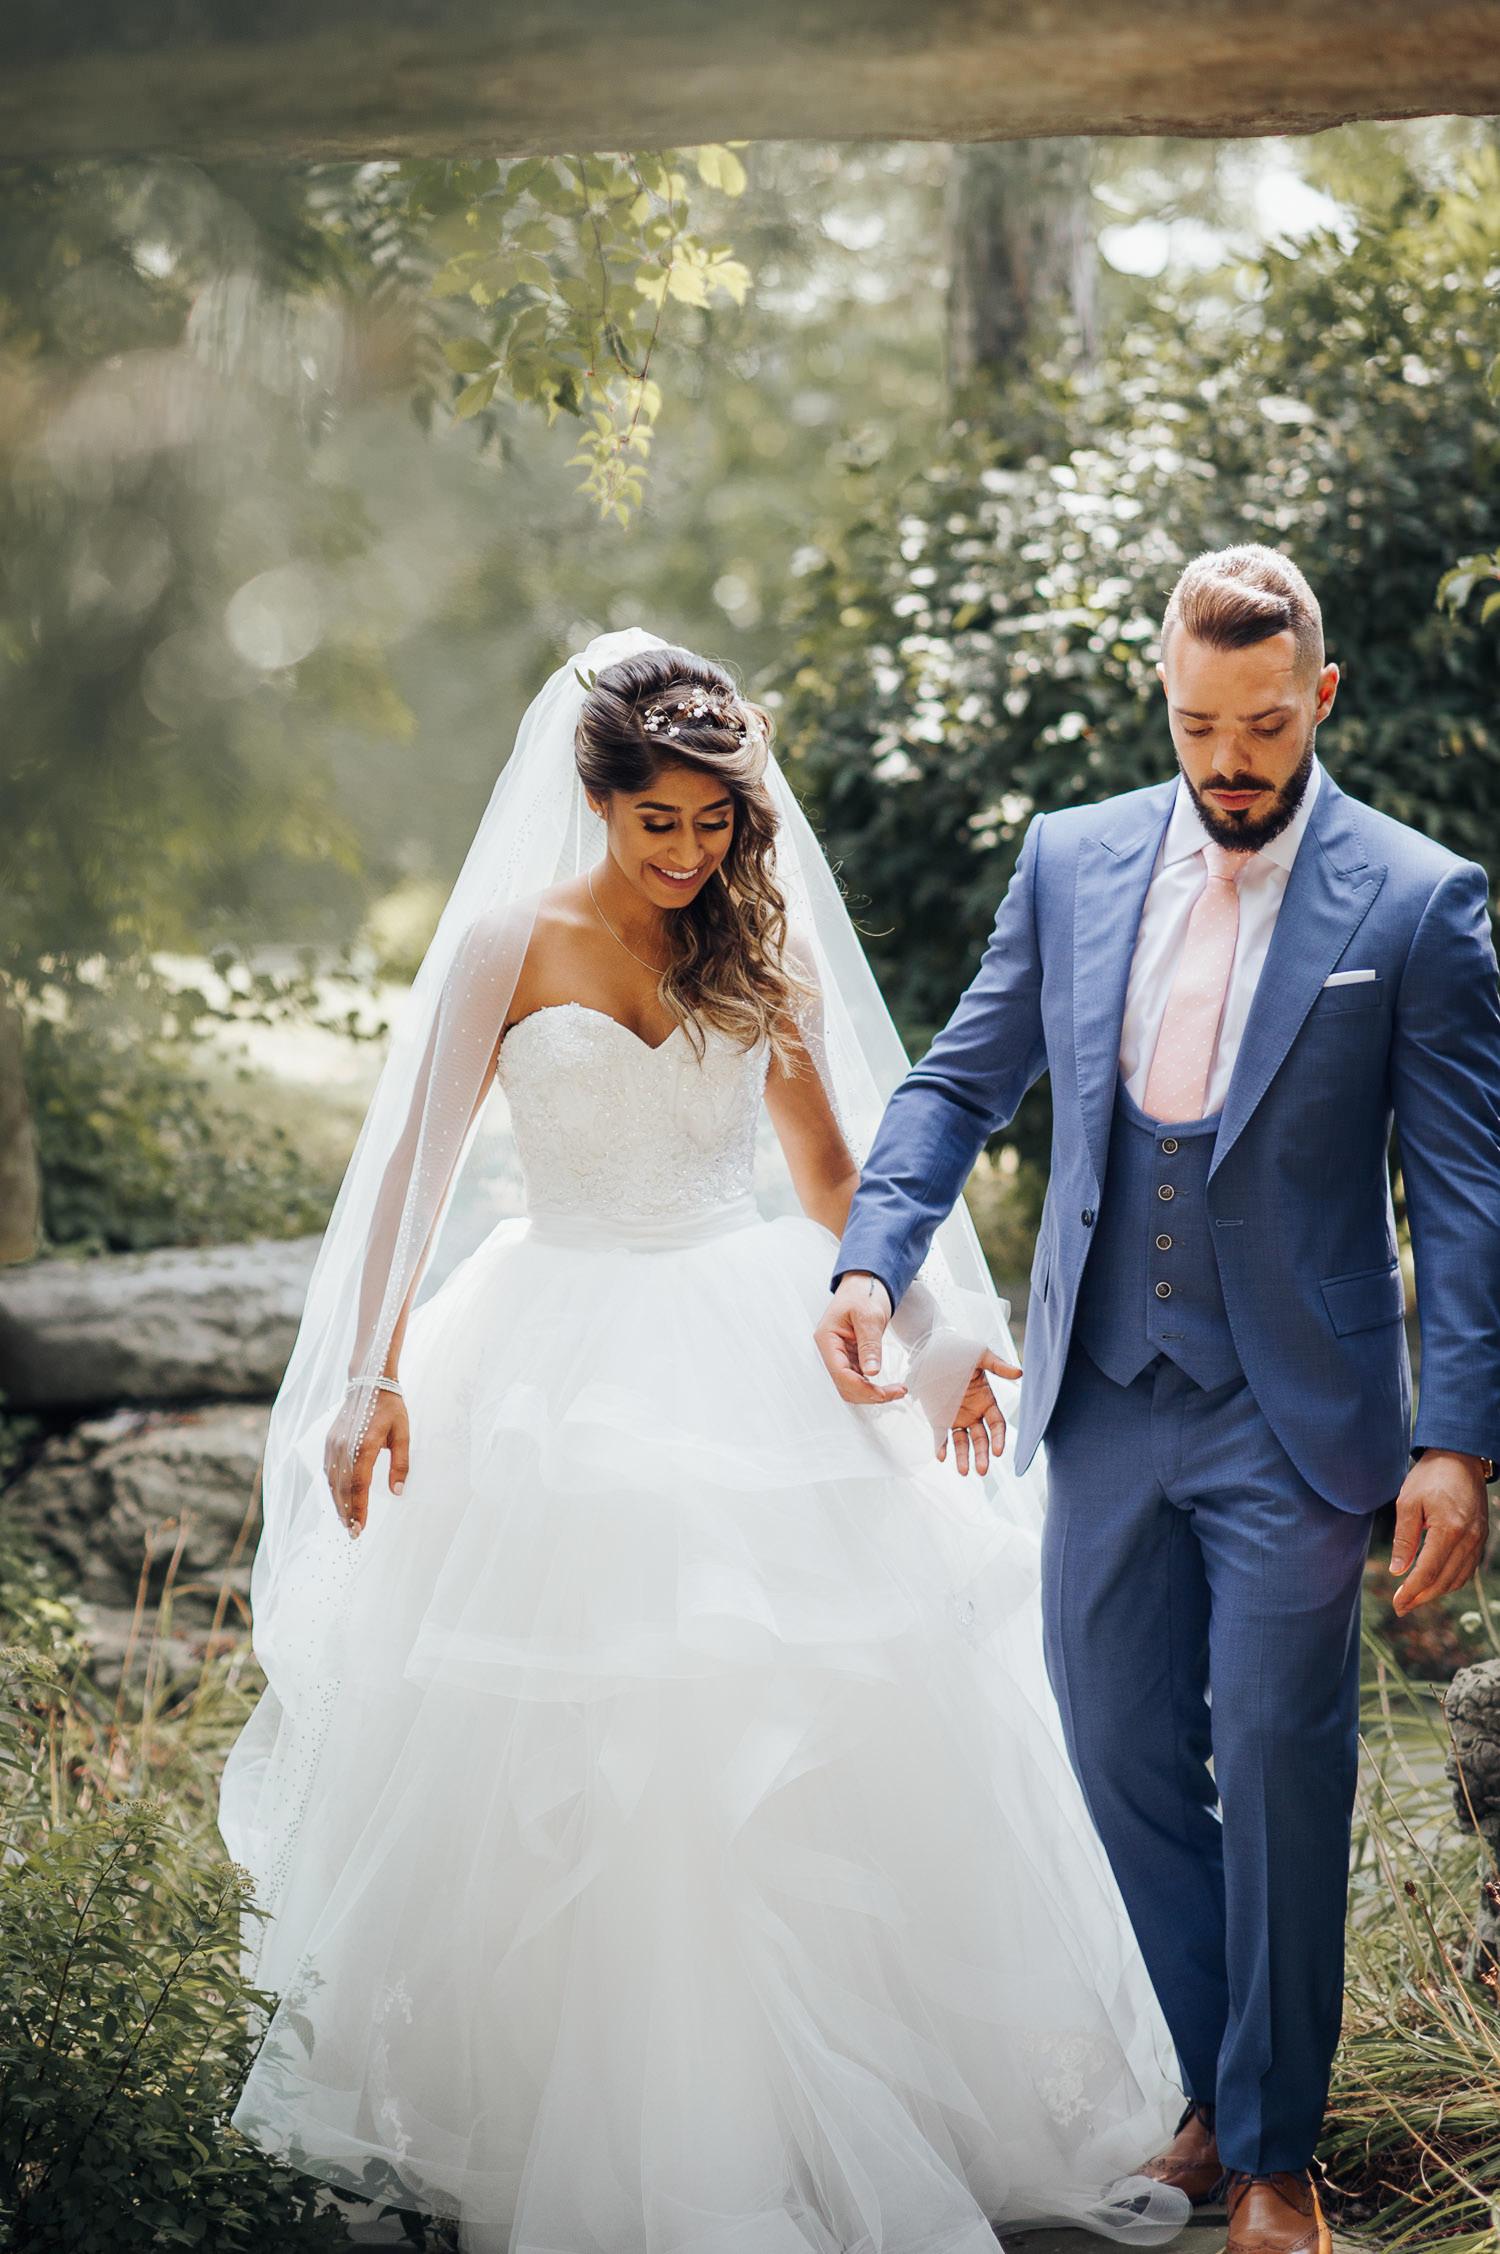 Toronto Garden Wedding Photography with a photo journalistic portrait